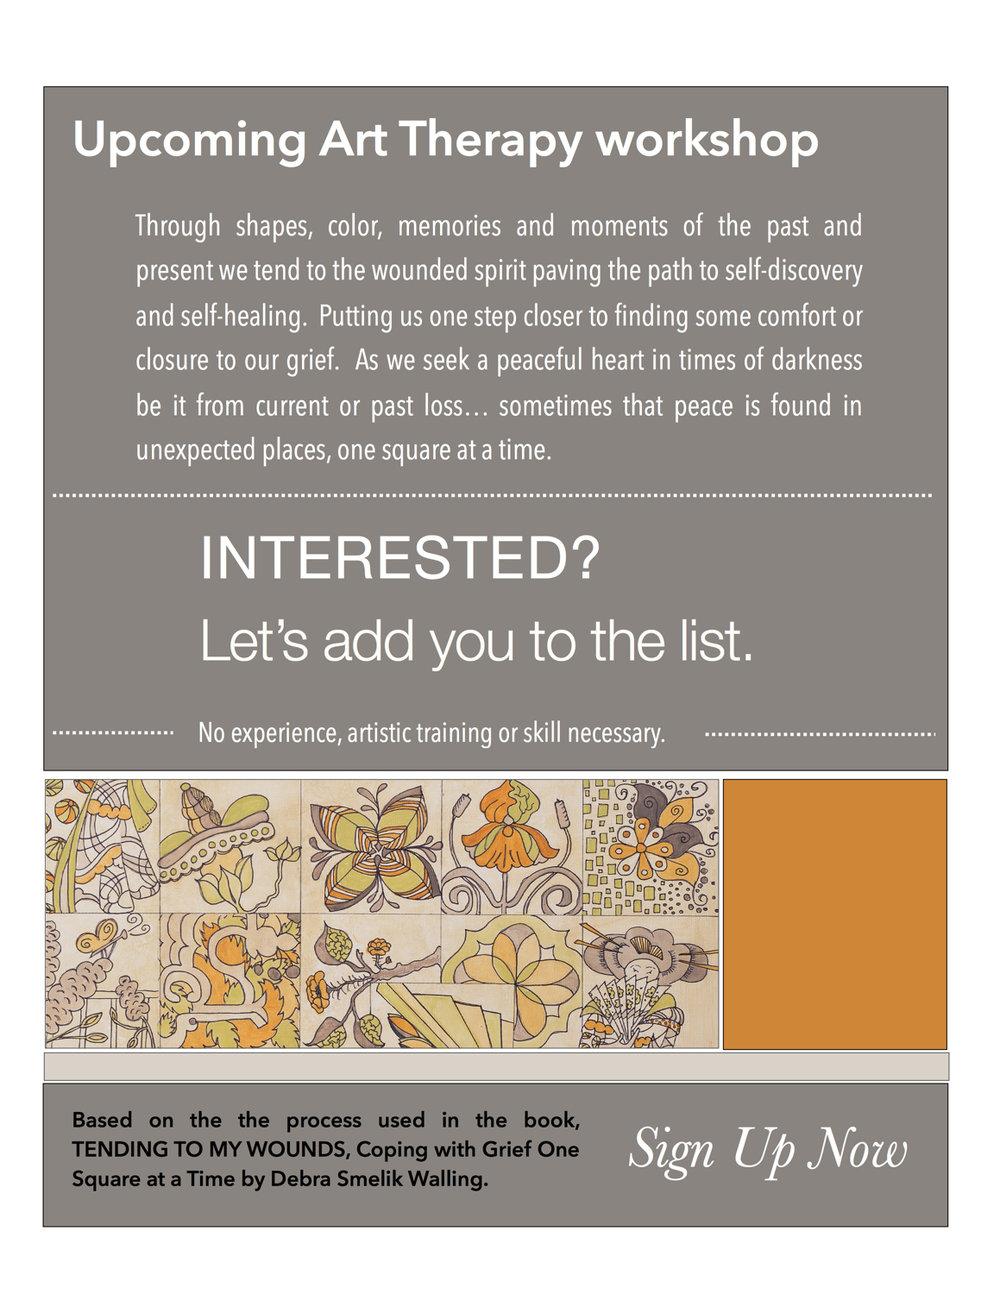 Art Therapy Workshop Flyer,1st workshop